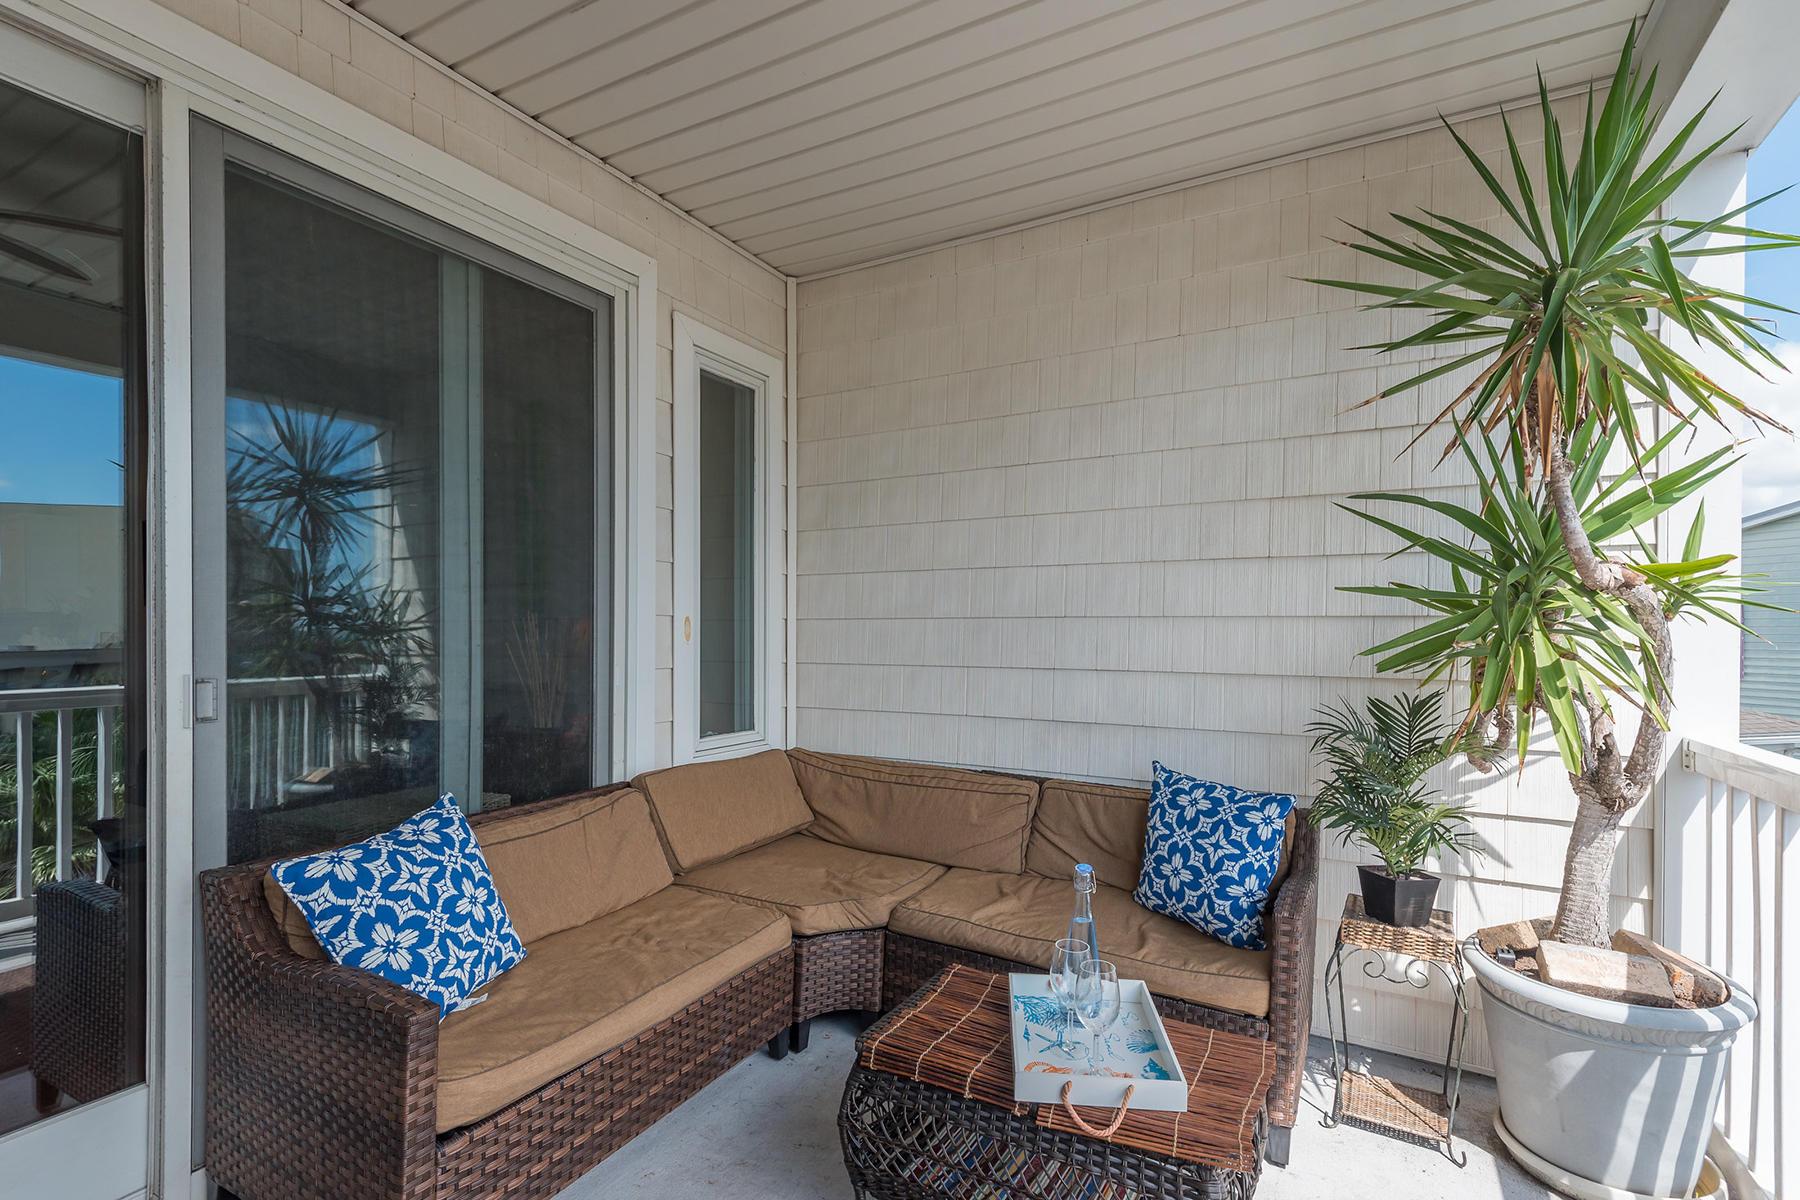 Pier Pointe Villas Homes For Sale - 114 Ashley, Folly Beach, SC - 2